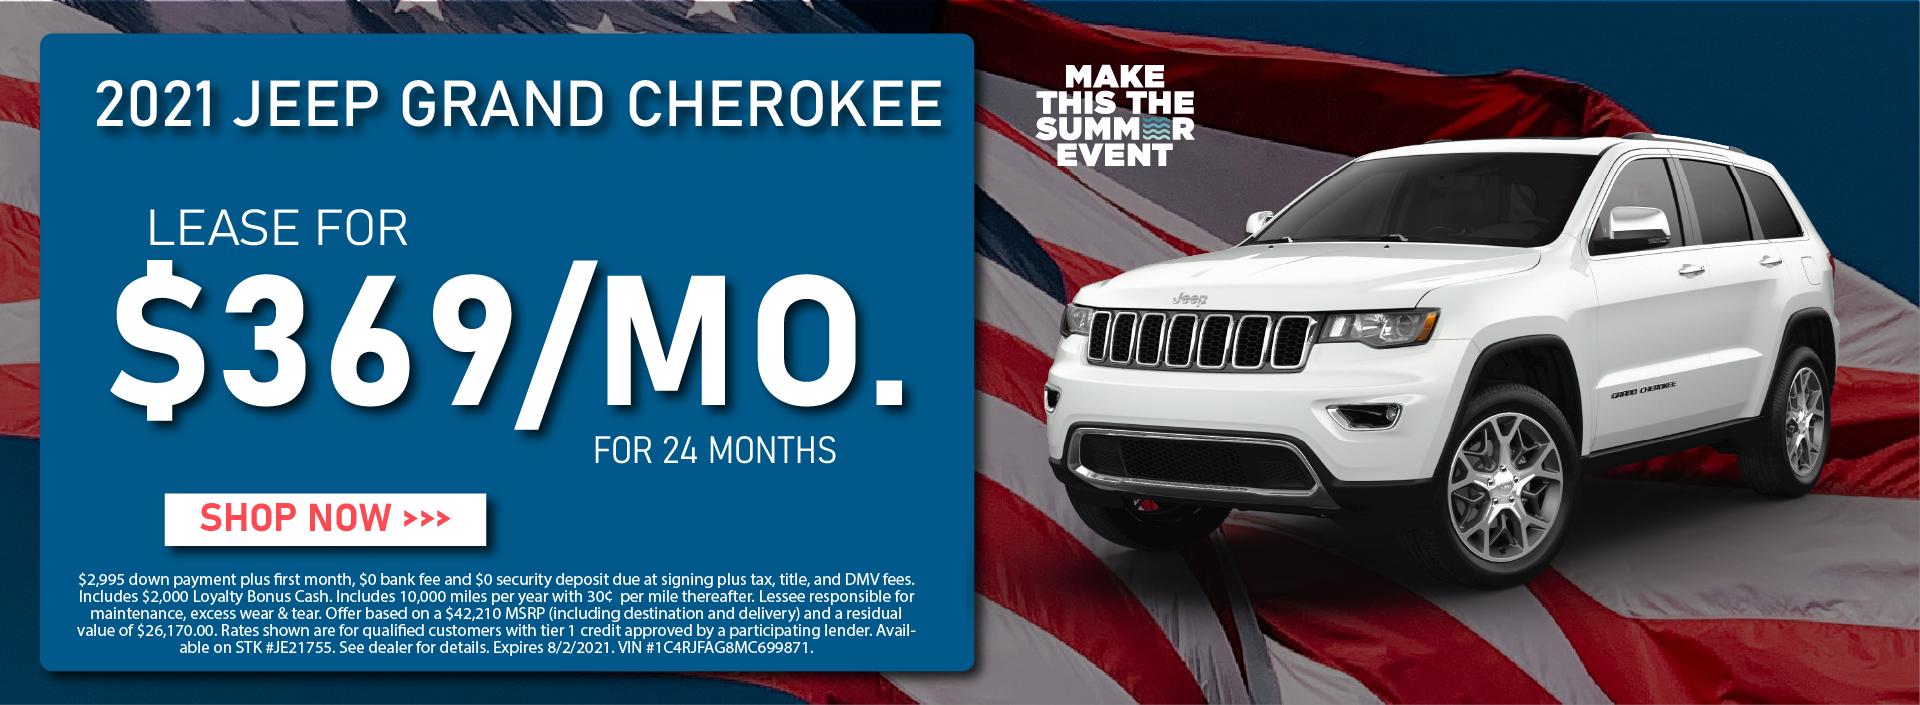 CDJR Manhattan – July 2021 – Jeep Grand Cherokee